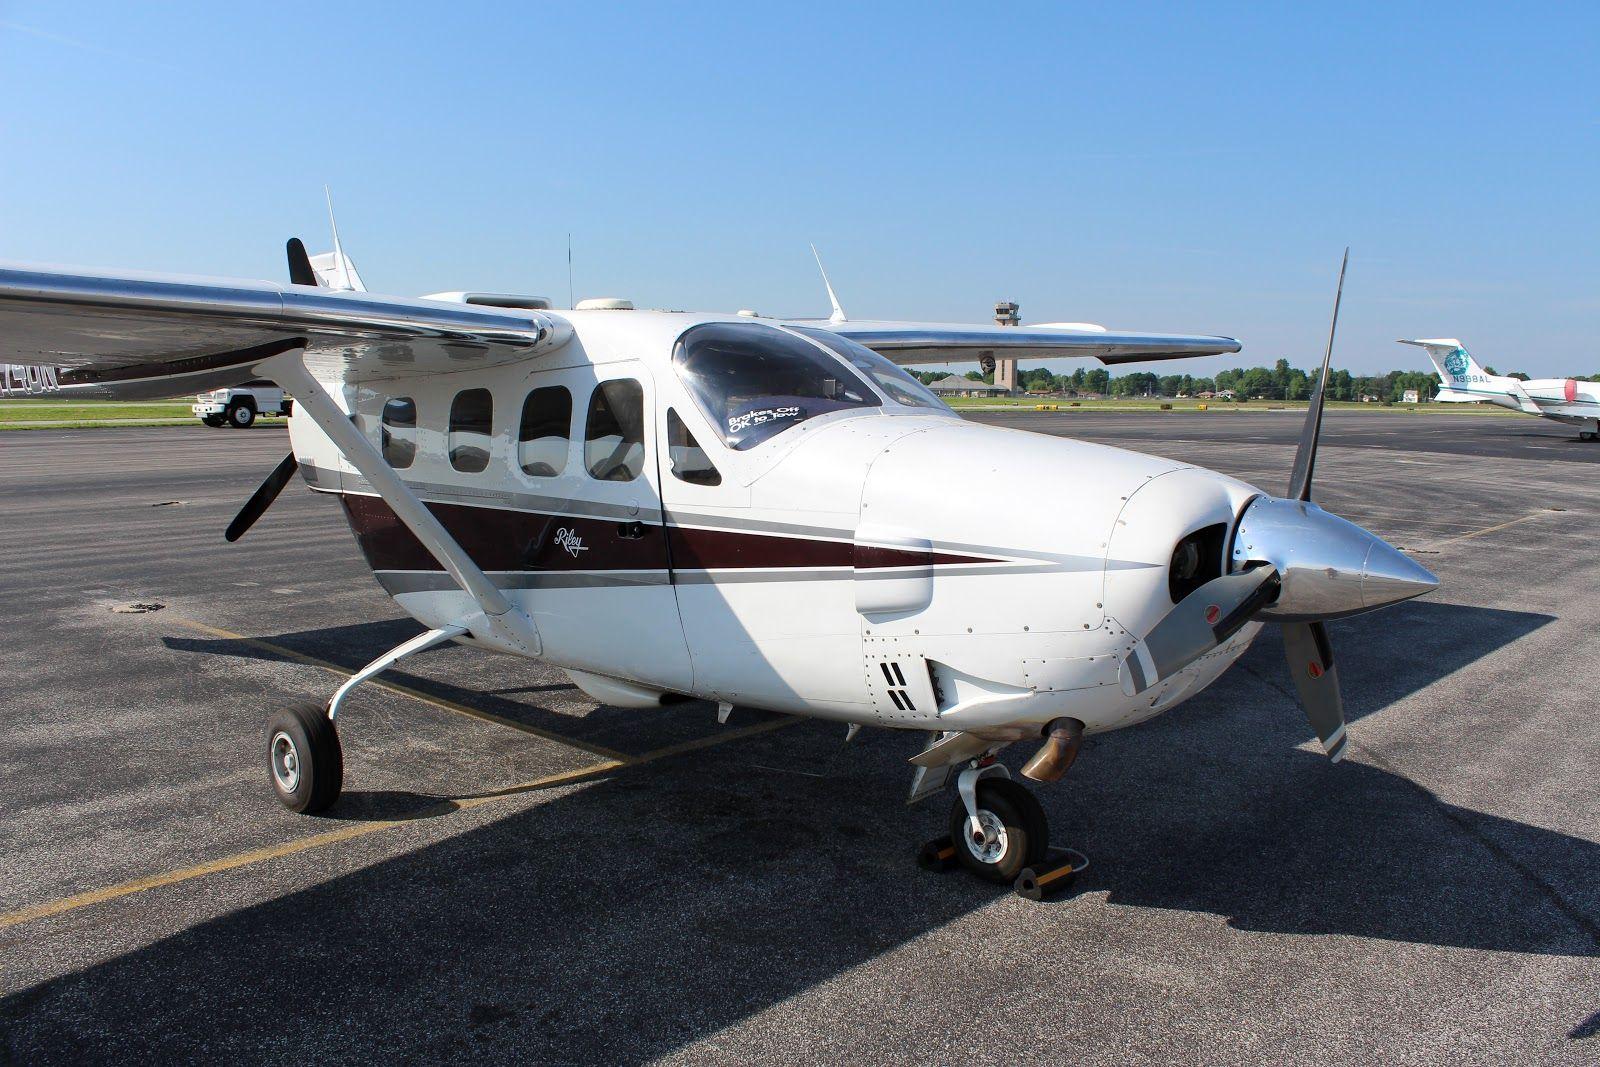 Sightings: Cessna P337H Riley Super Rocket Conversion